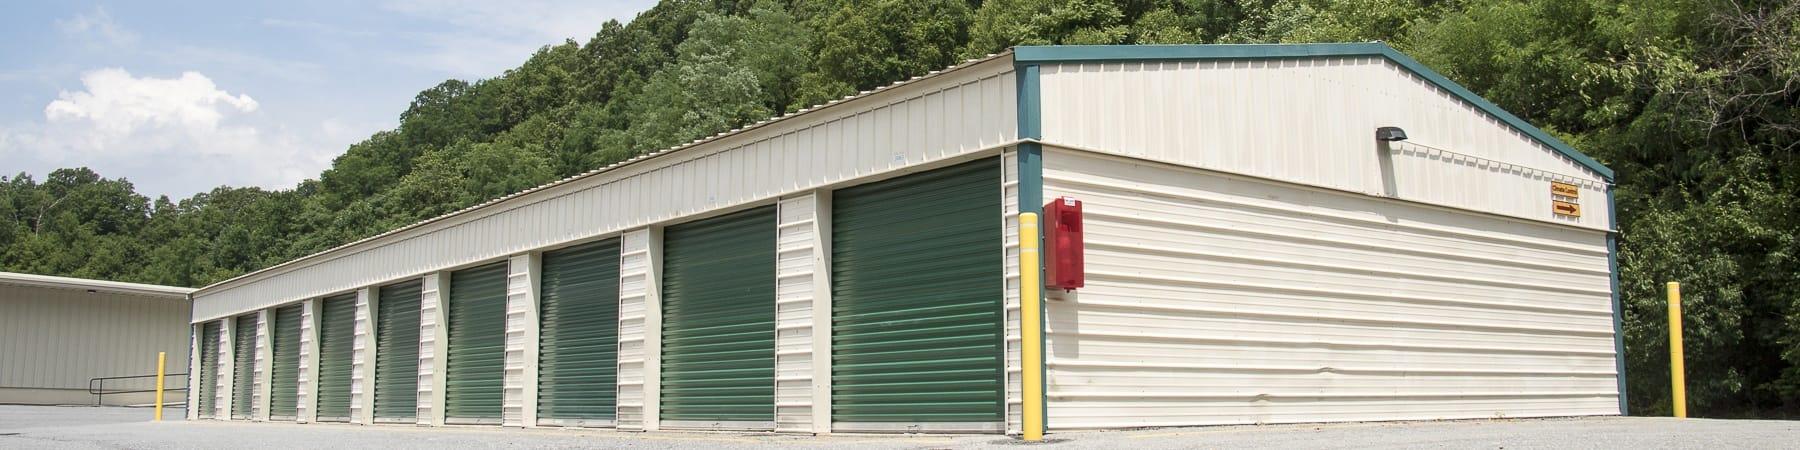 Free Truck Rental at Storage World Self Storage Units